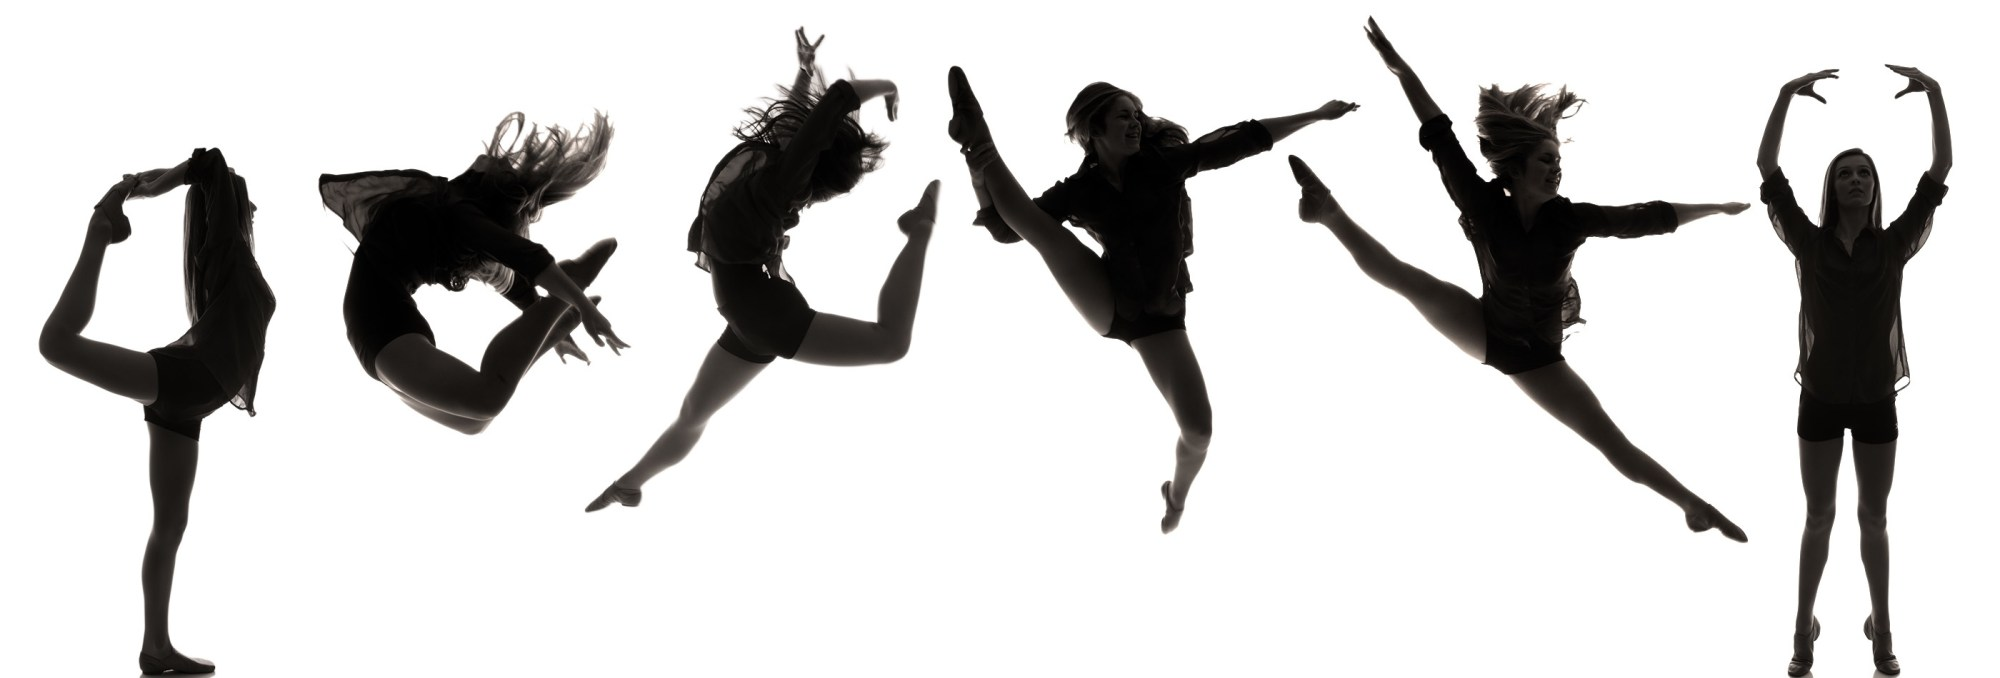 hight resolution of 2800x950 dance ballroom dancing clip art vector ballroom dancing graphics